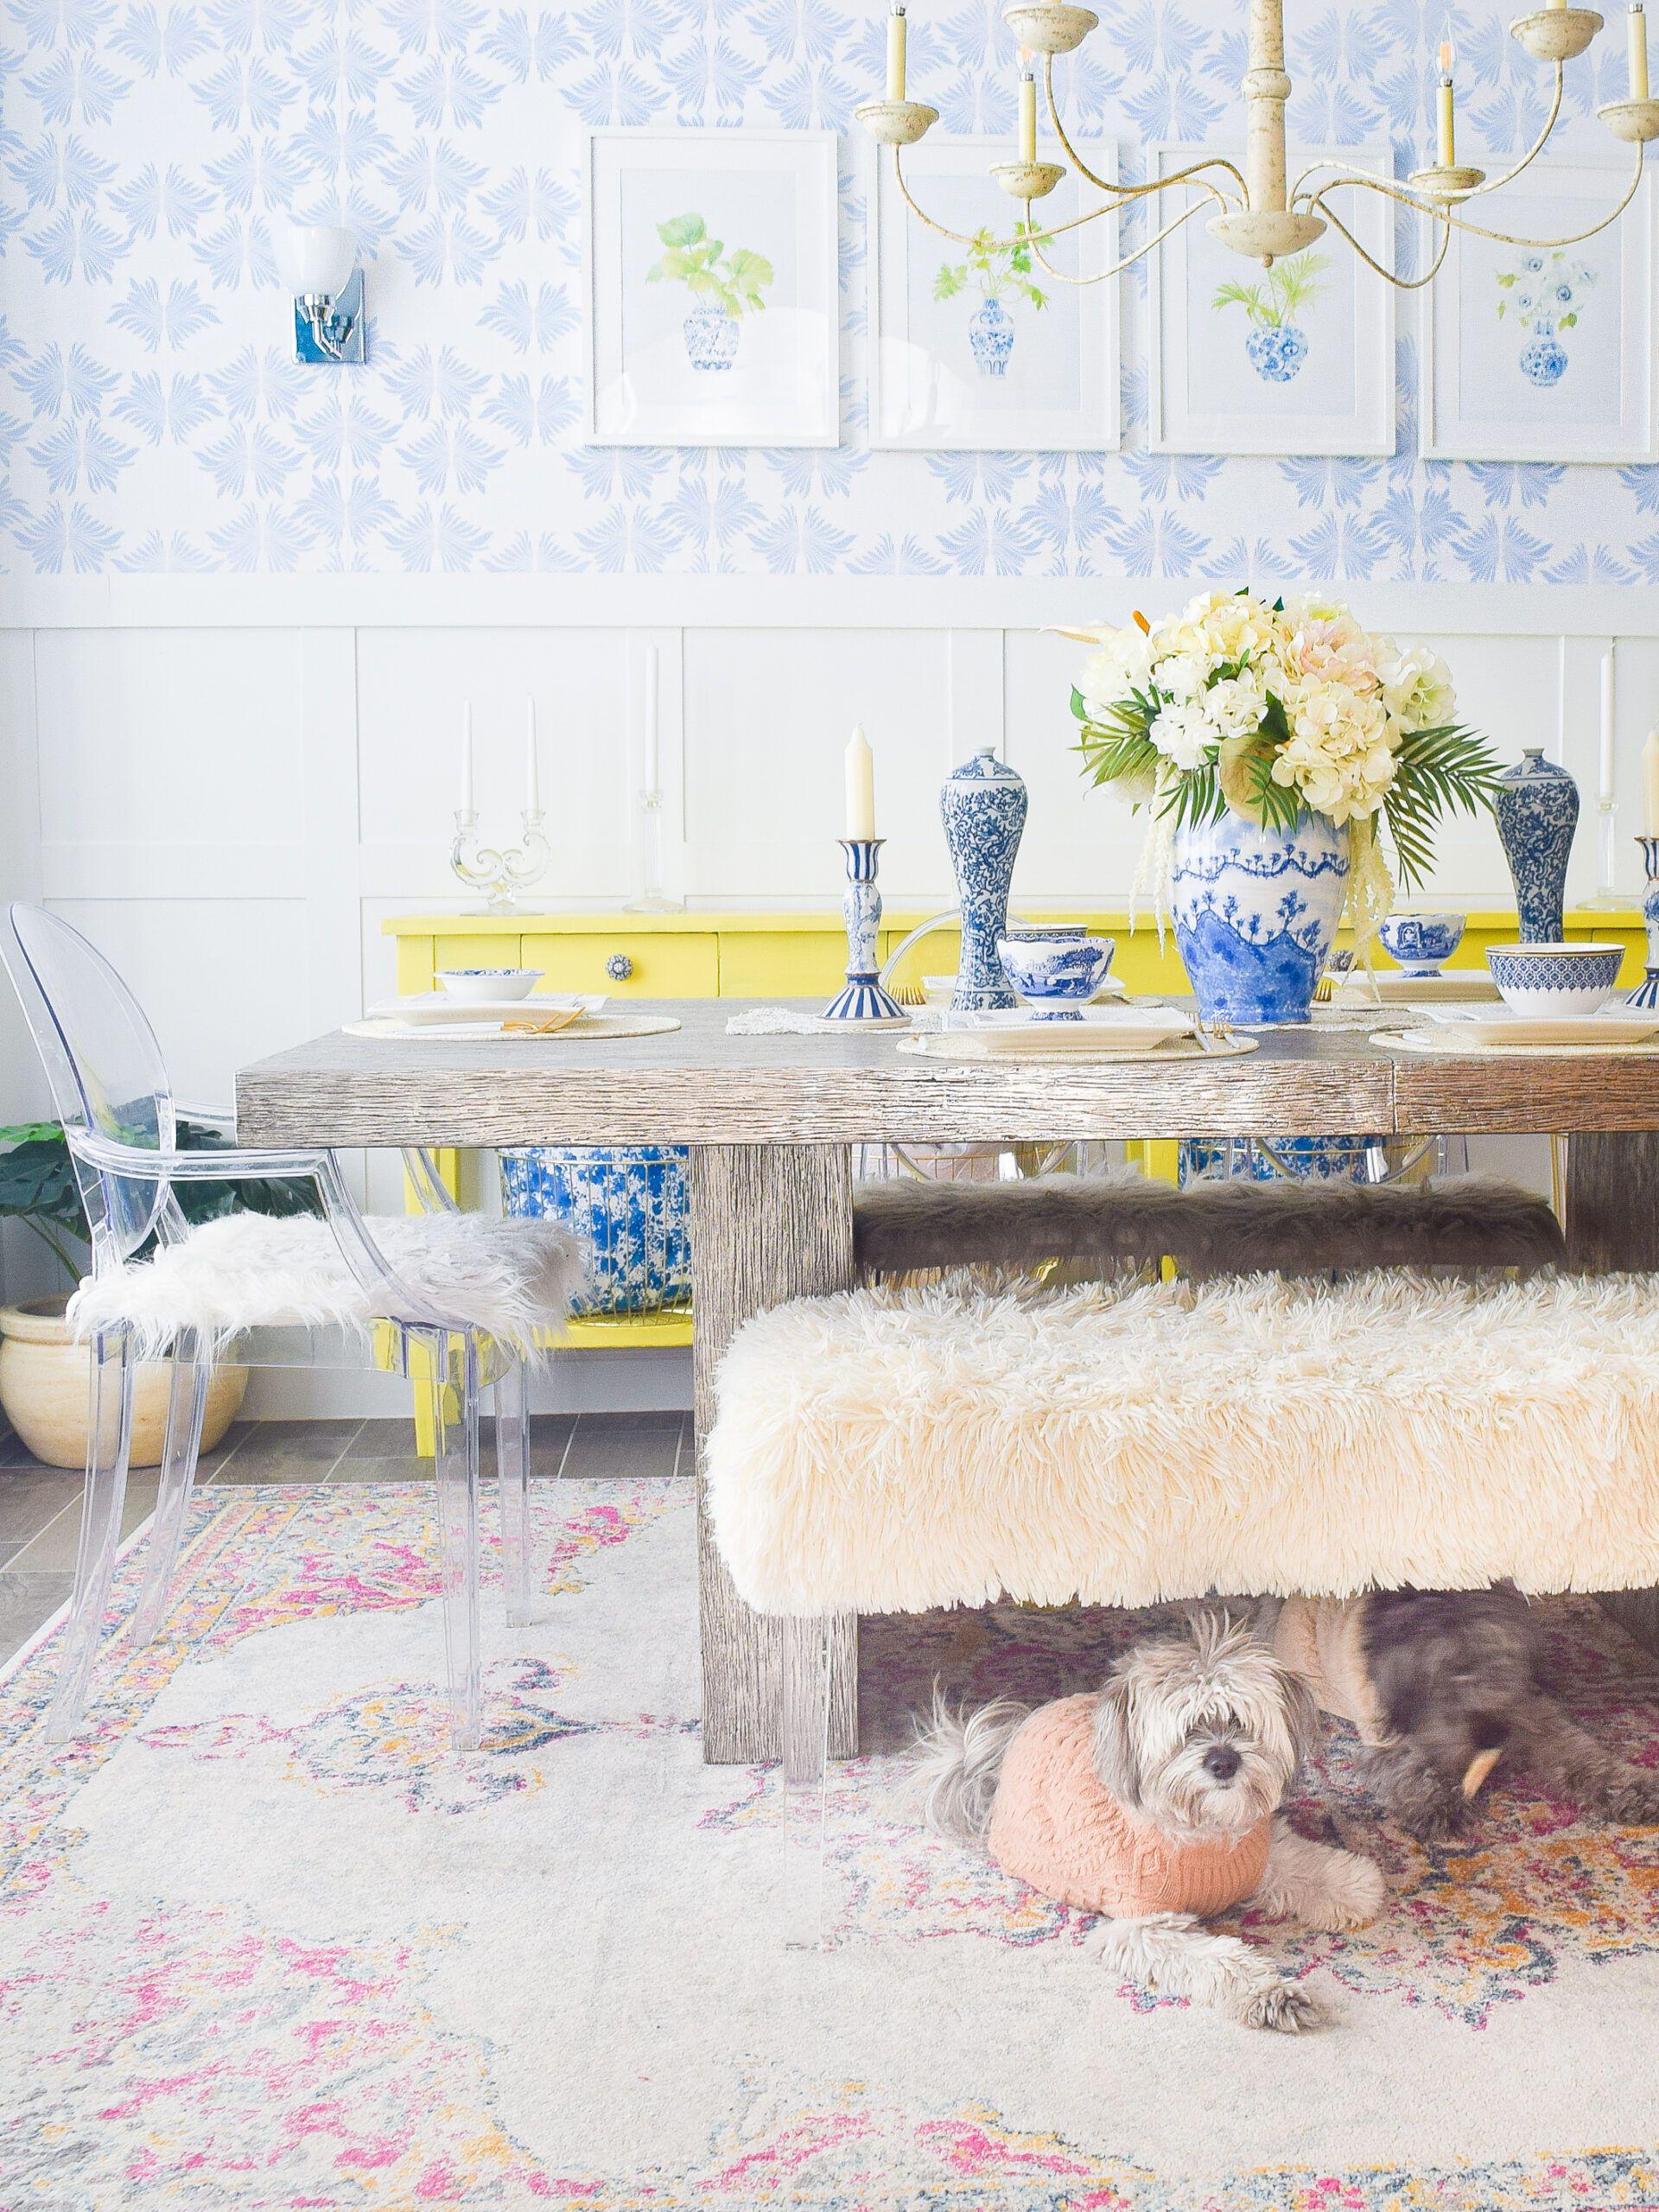 Sarah Annie Wallpaper •Dining Room Wallpaper • We Are The Joneses • Merichelle Jones